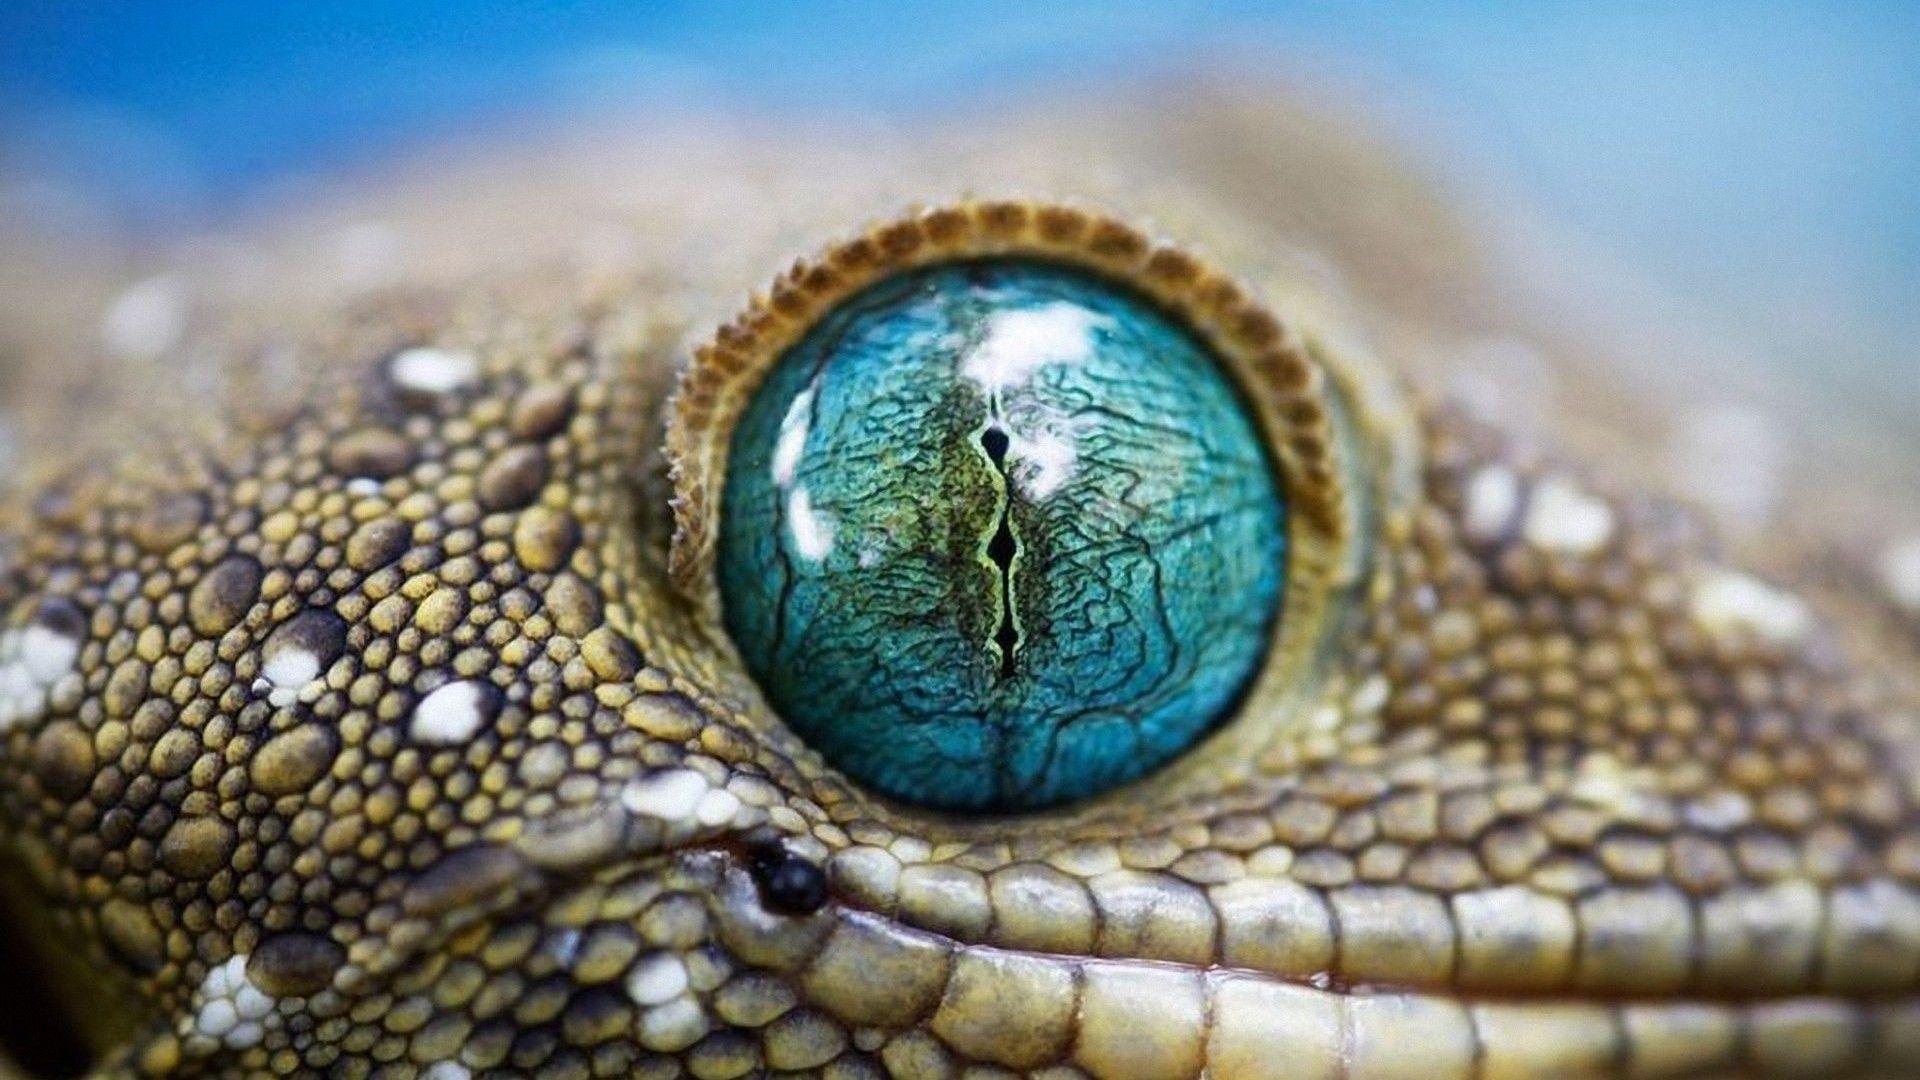 Crazy Macro photography of eyes